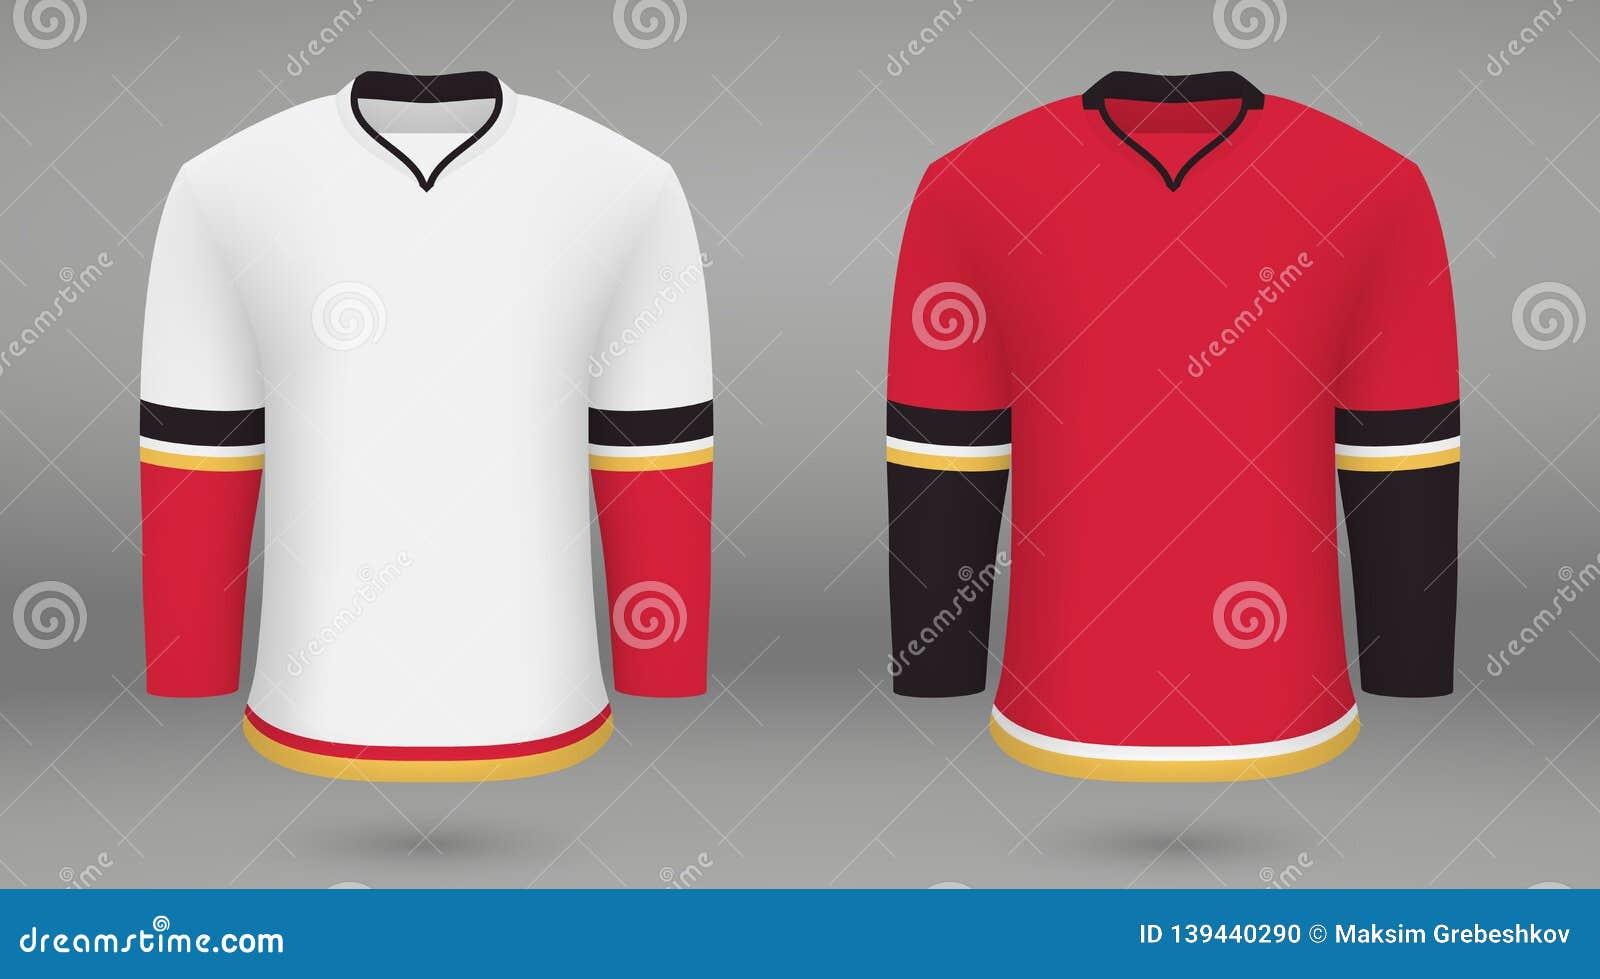 size 40 dc17d a63e8 Shirt Template Forice Hockey Jersey Stock Illustration ...